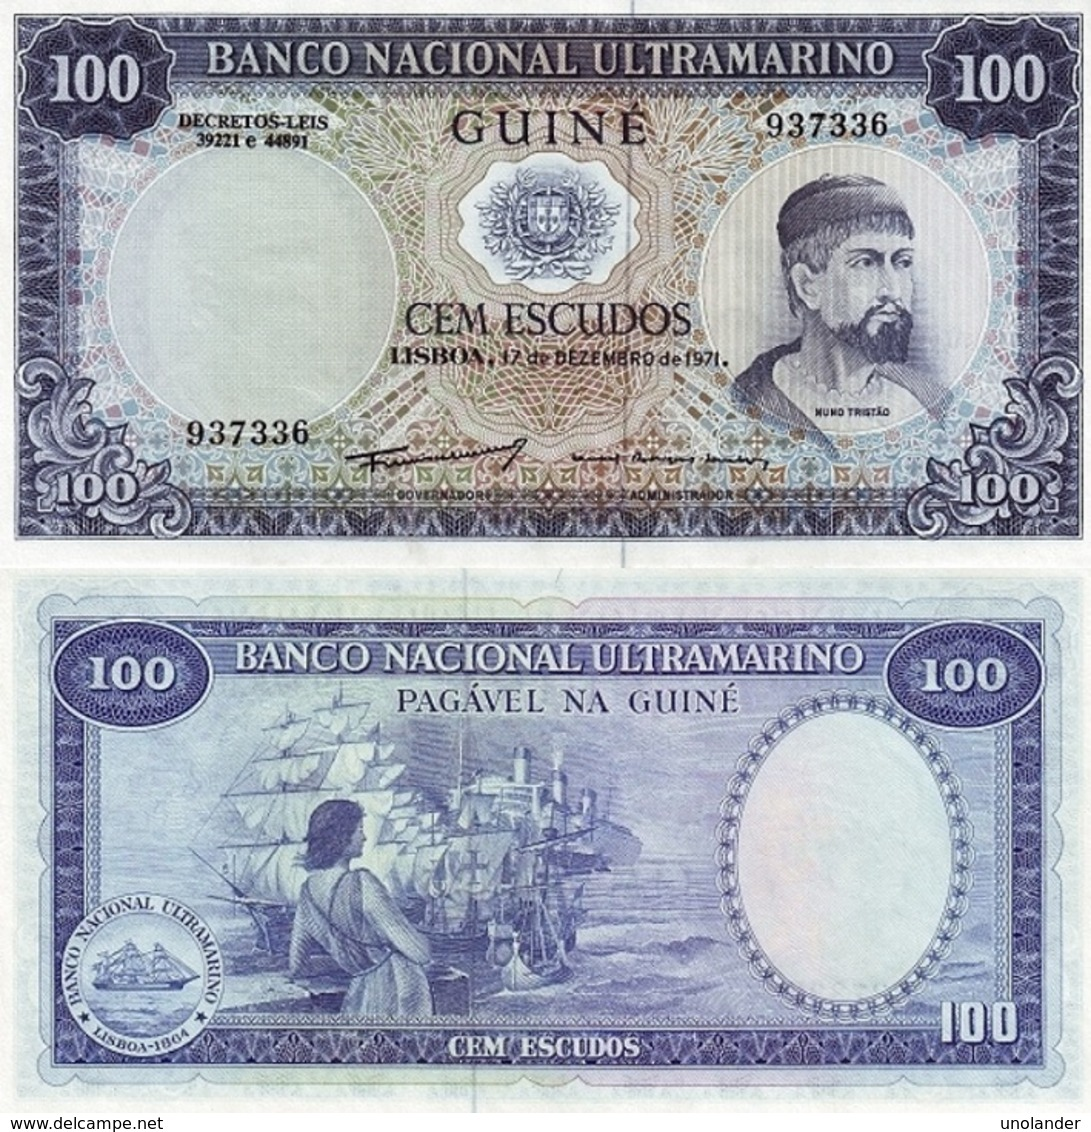 PORTUGAL Portuguese Guinea Guinea Bisau 100 Escudos 1971 P 45 UNC - Guinea